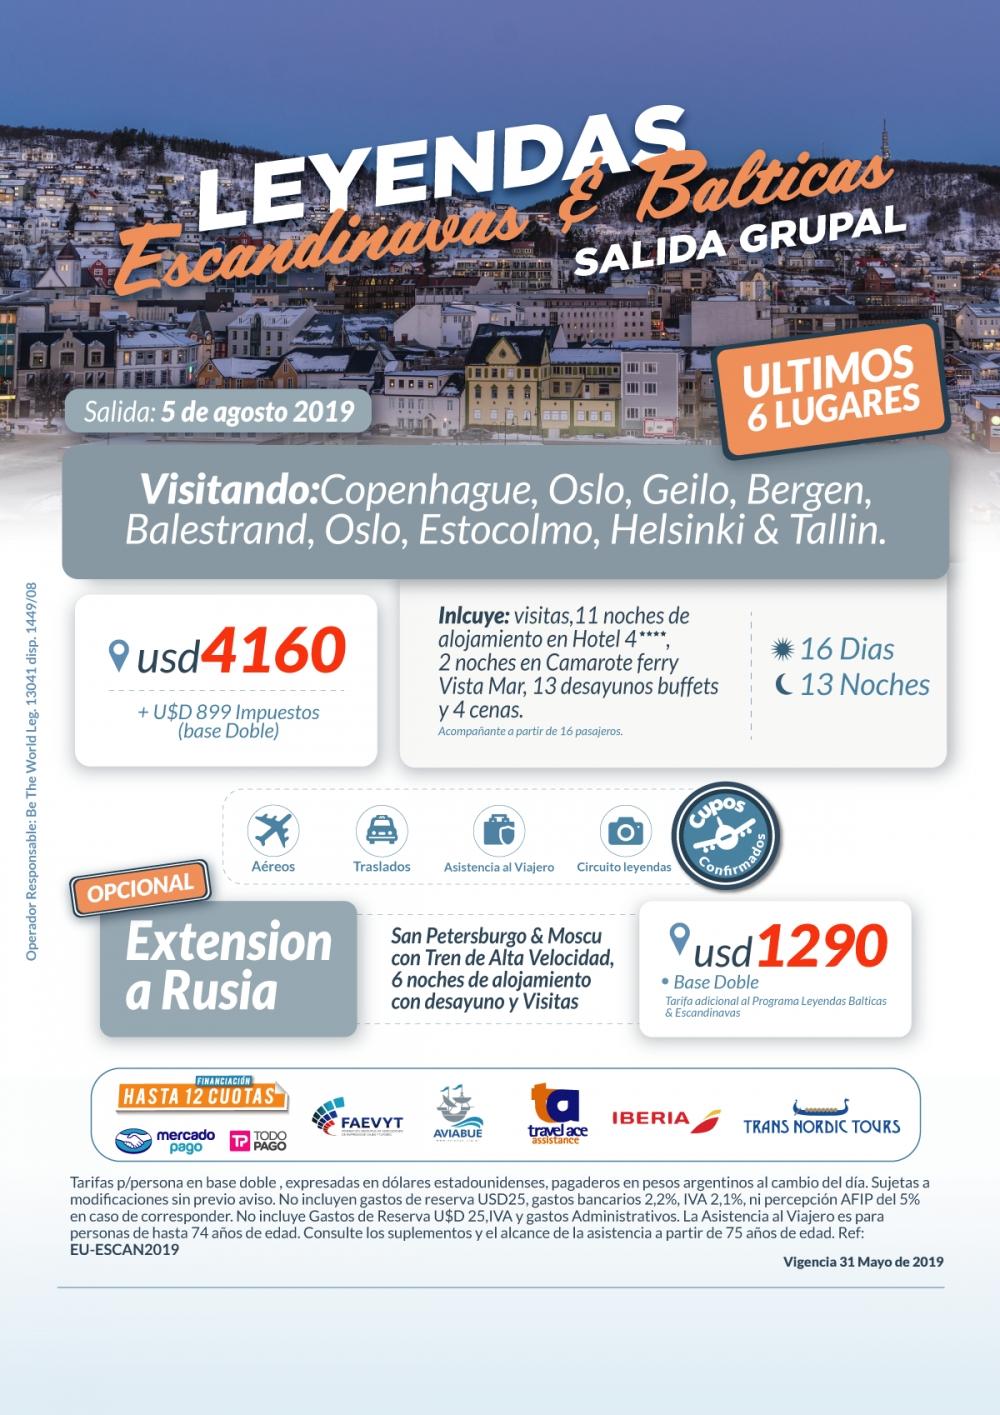 SALIDA GRUPAL 05 DE AGOSTO 2019  - Leyendas Escandinavas & Bálticas